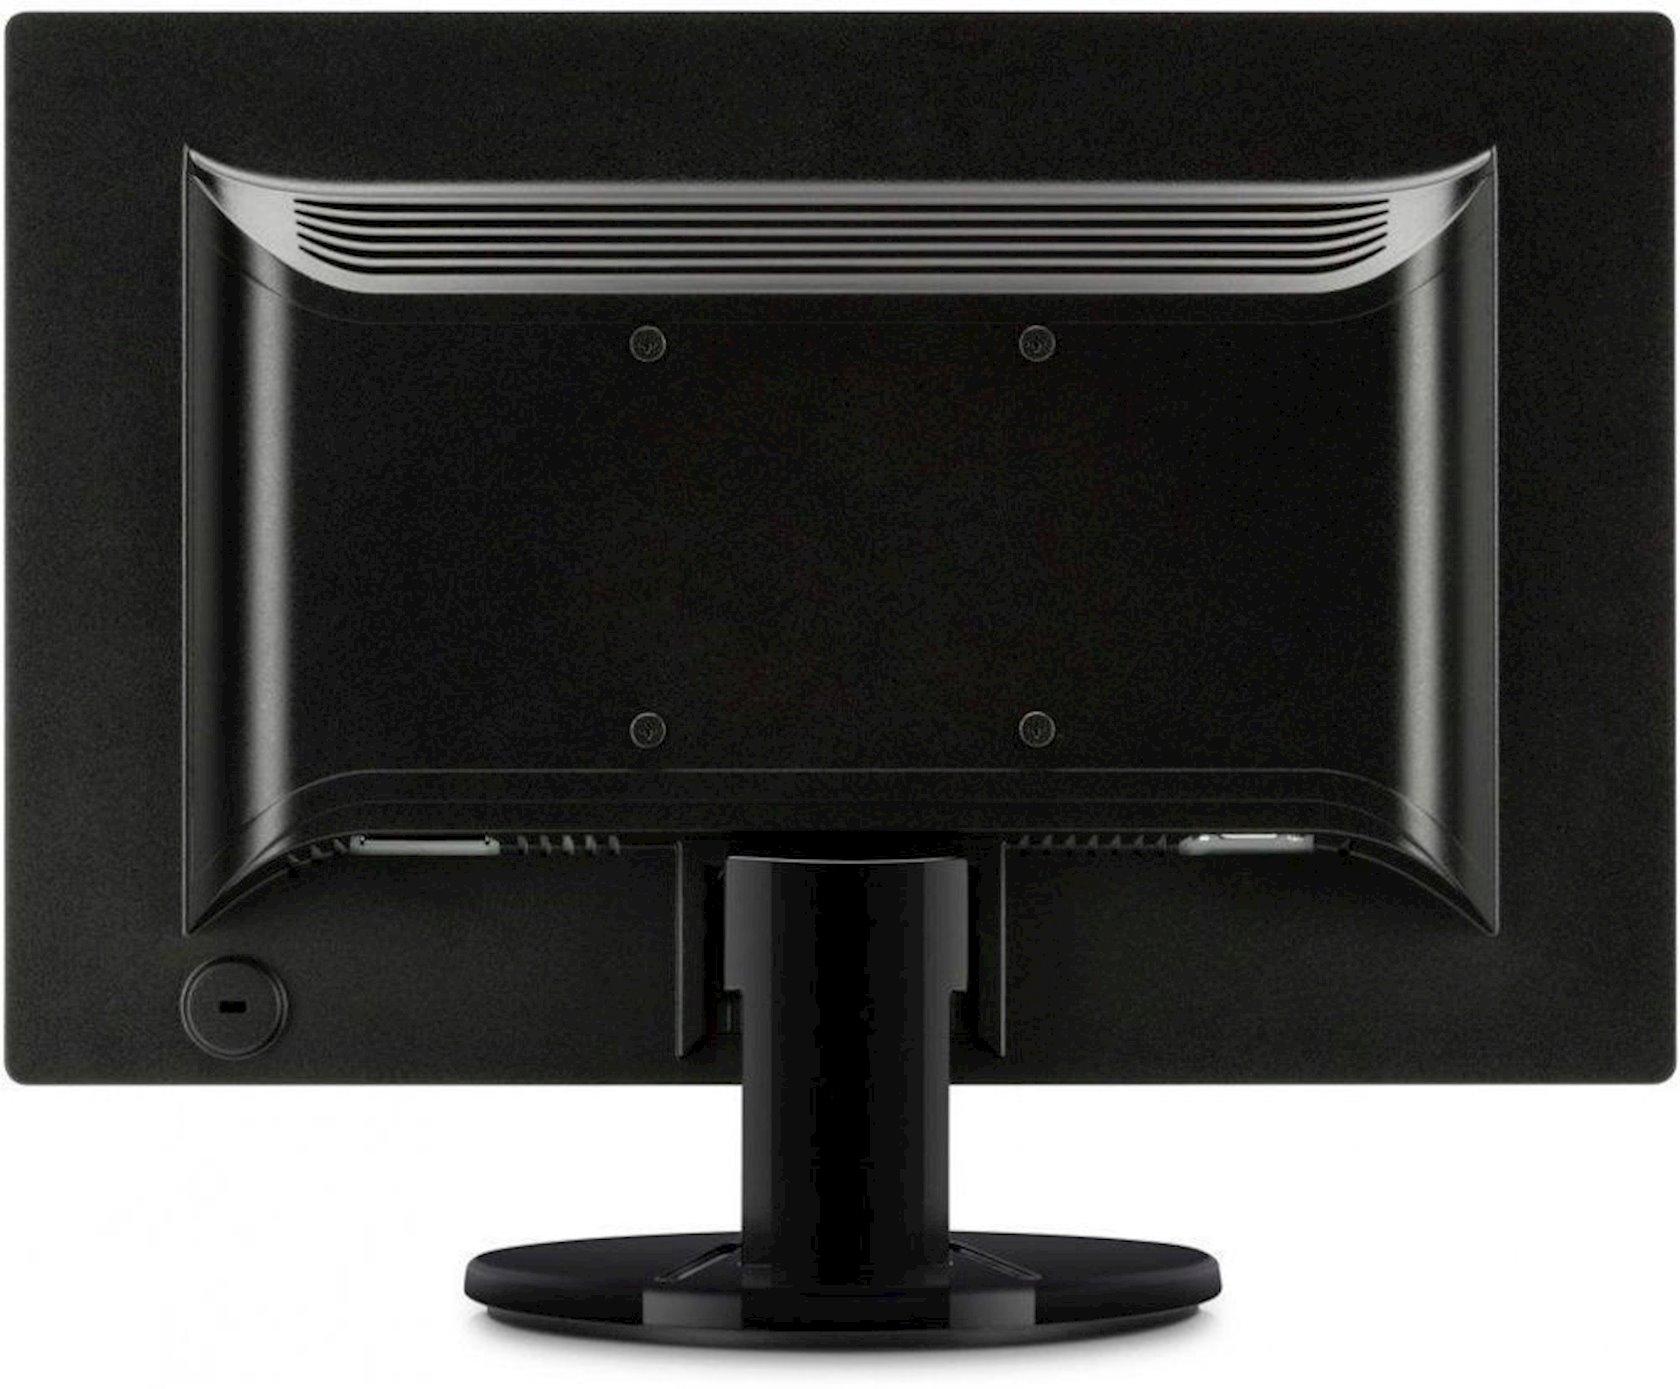 Monitor HP 19ka 18.5-inch T3U81AA